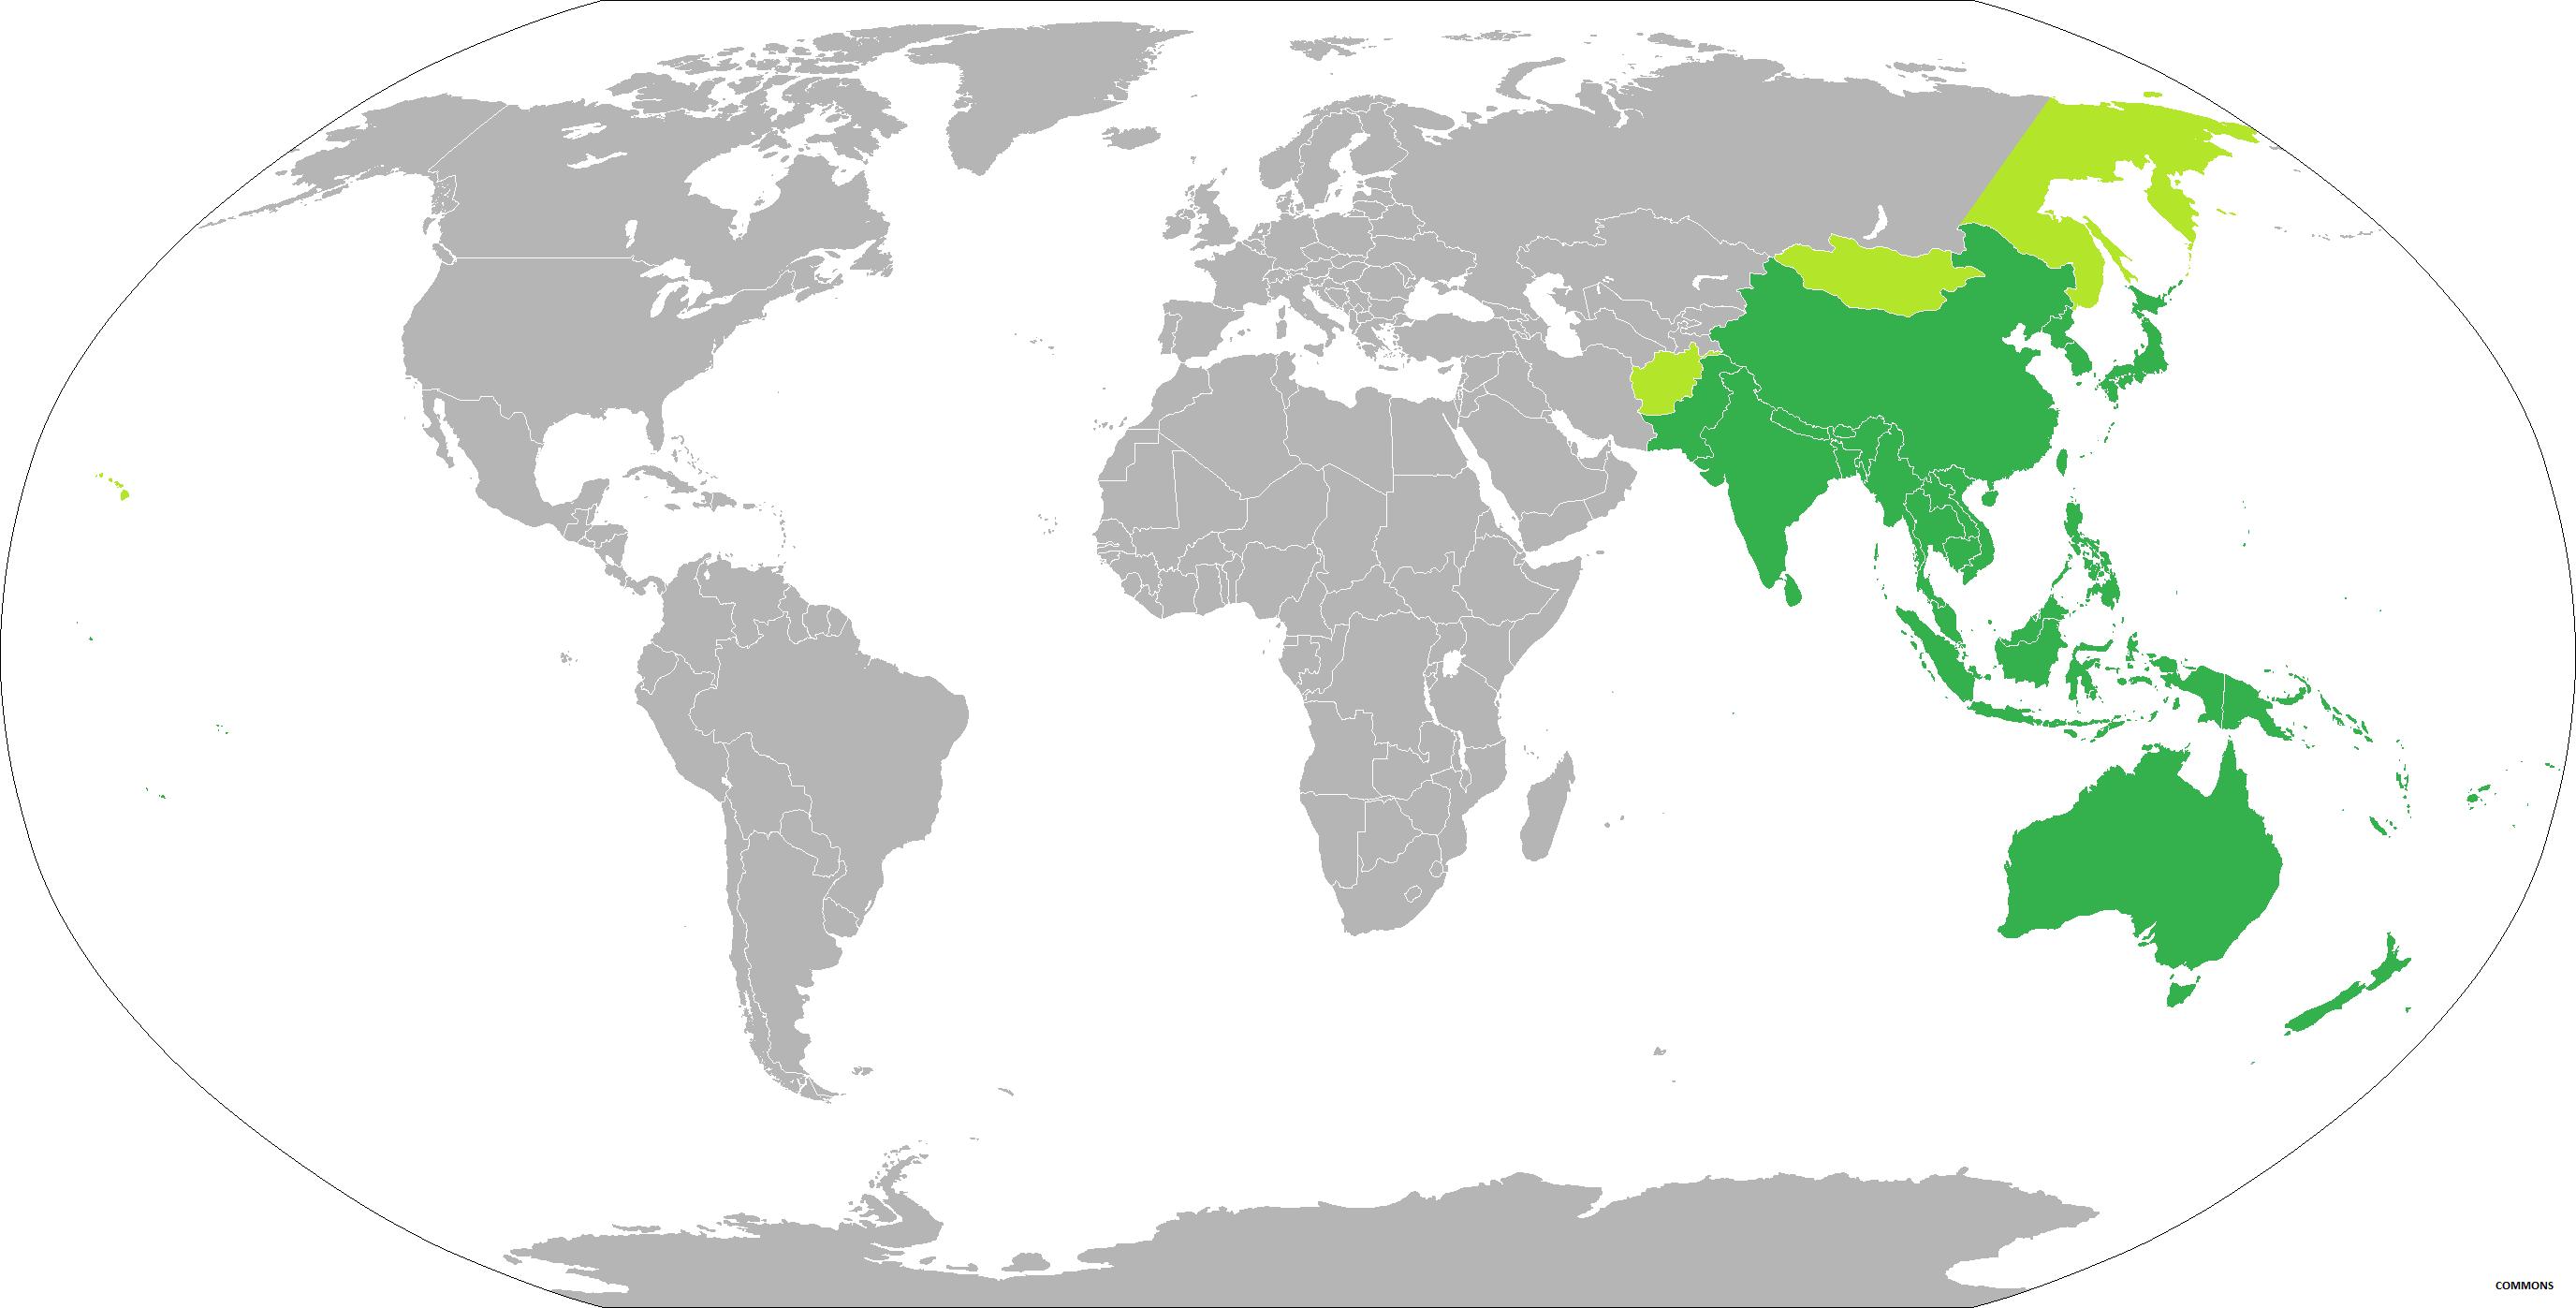 ASIA PACIFIC IN THE GLOBE